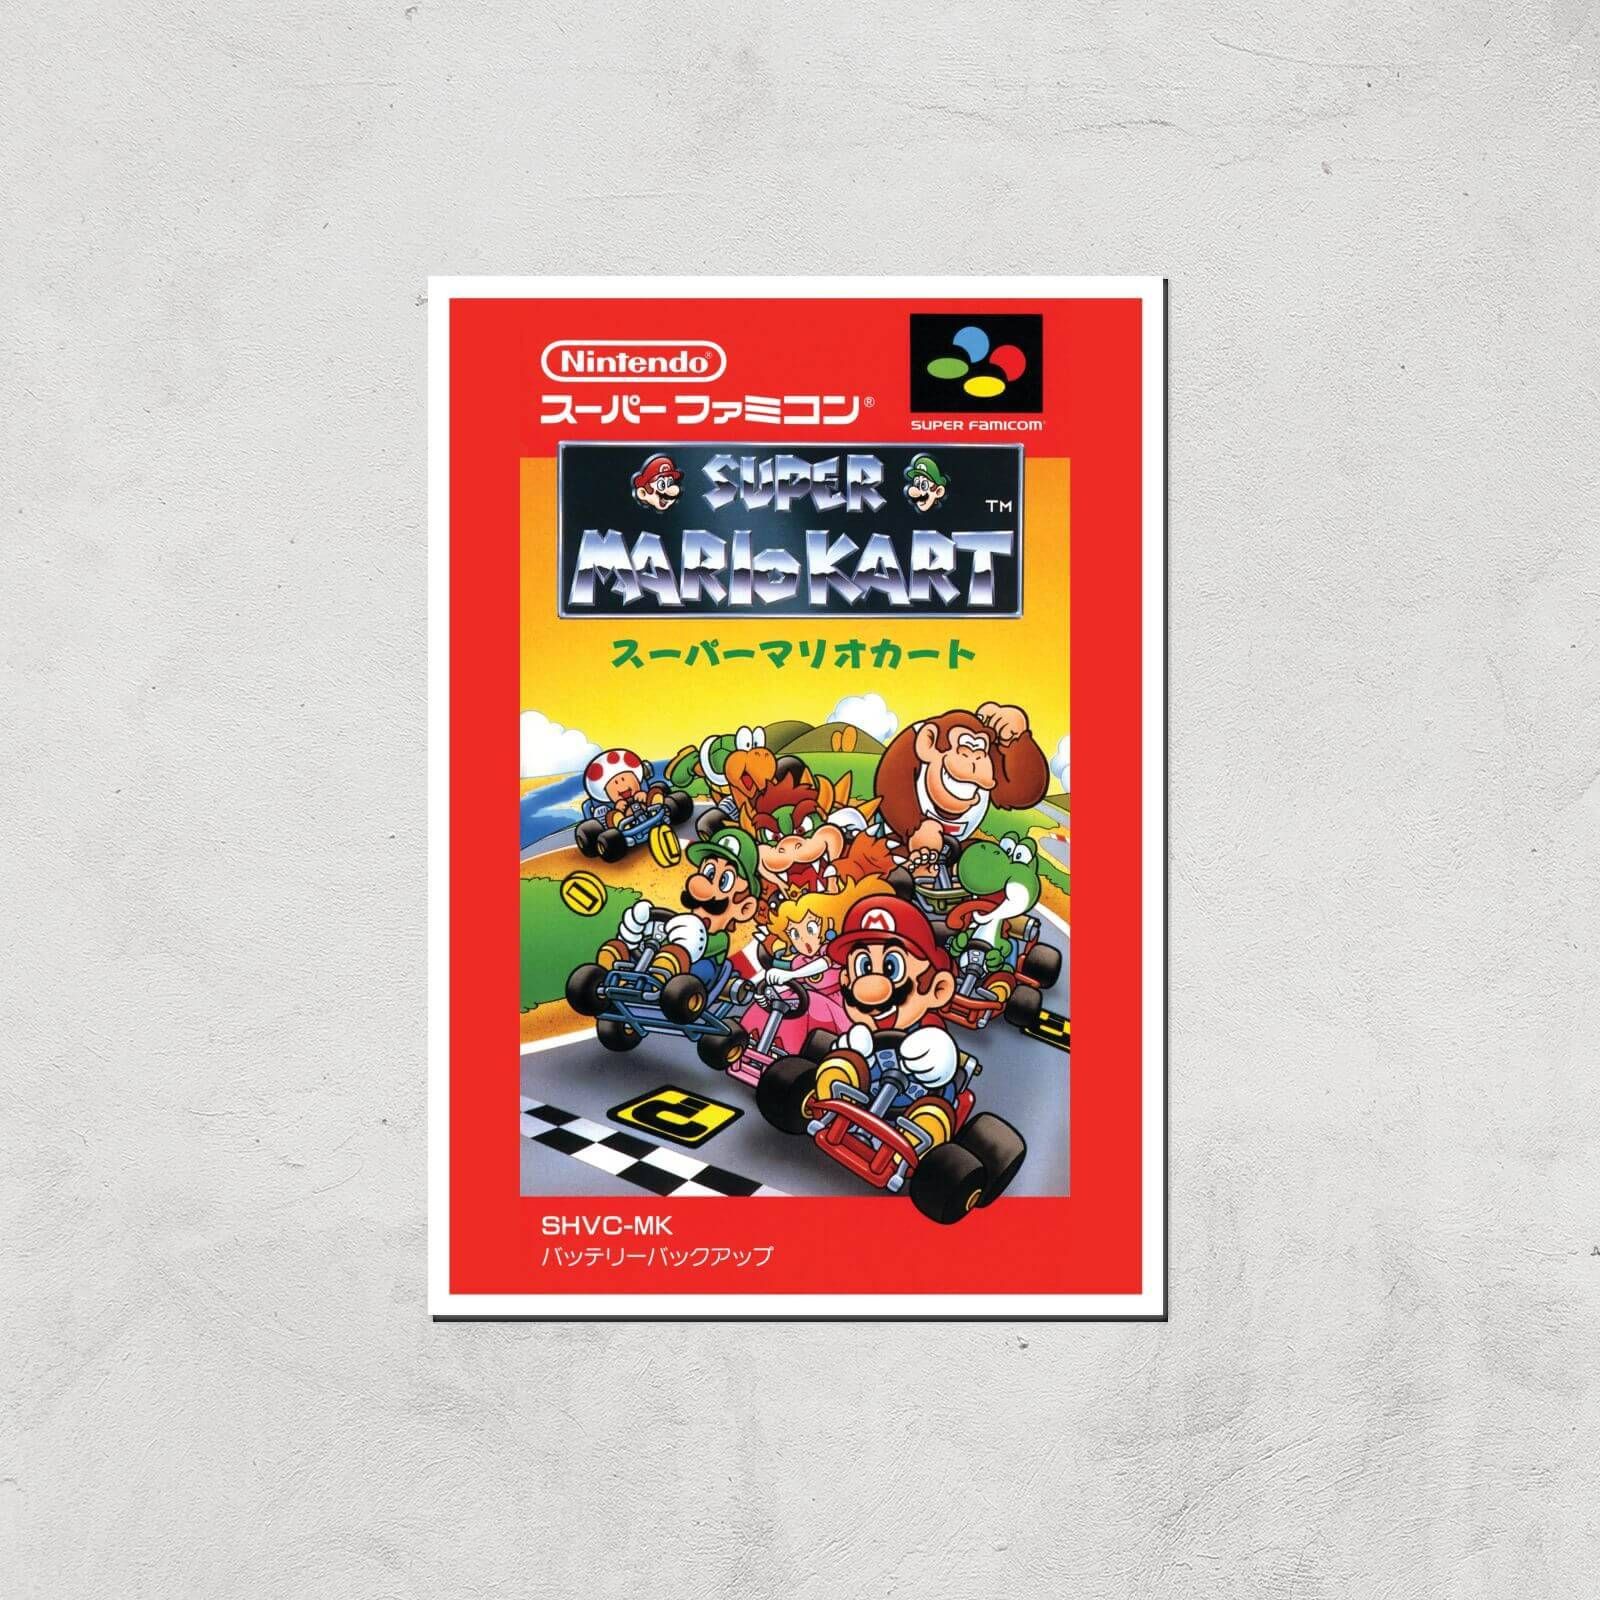 Nintendo Retro Super Mario Kart Cover Art Print - A4 - Print Only